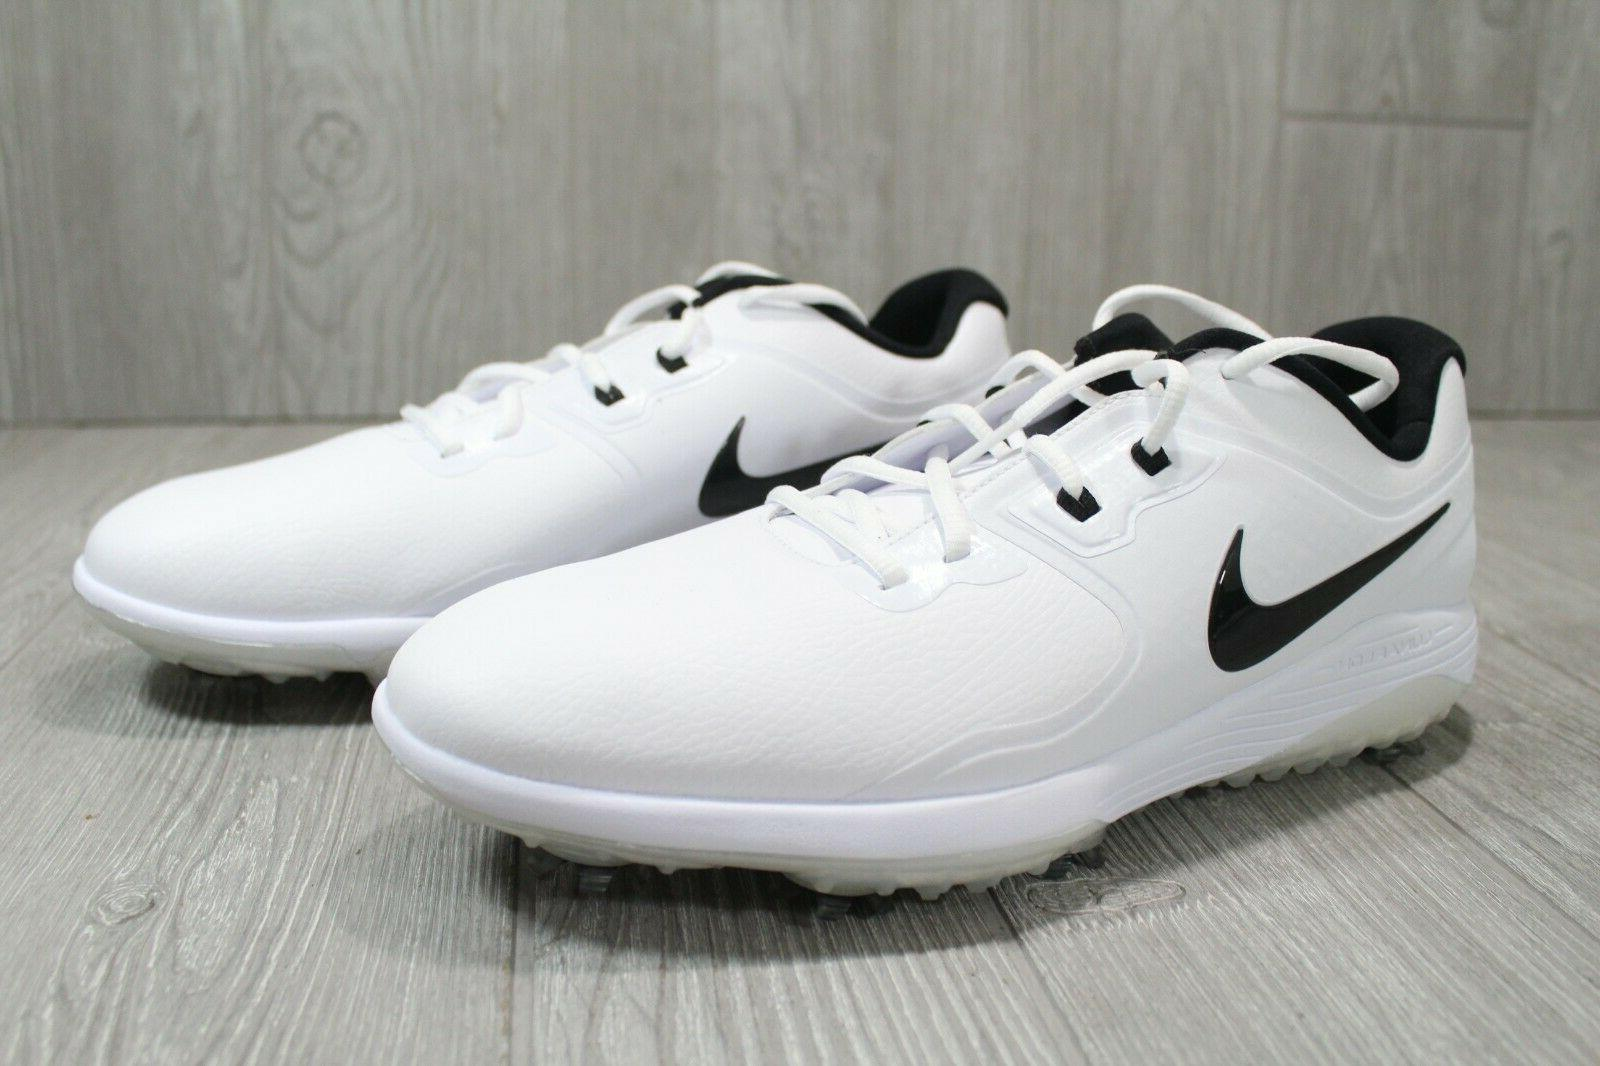 52 Nike Men's Shoes AQ2197-101 White Black 8